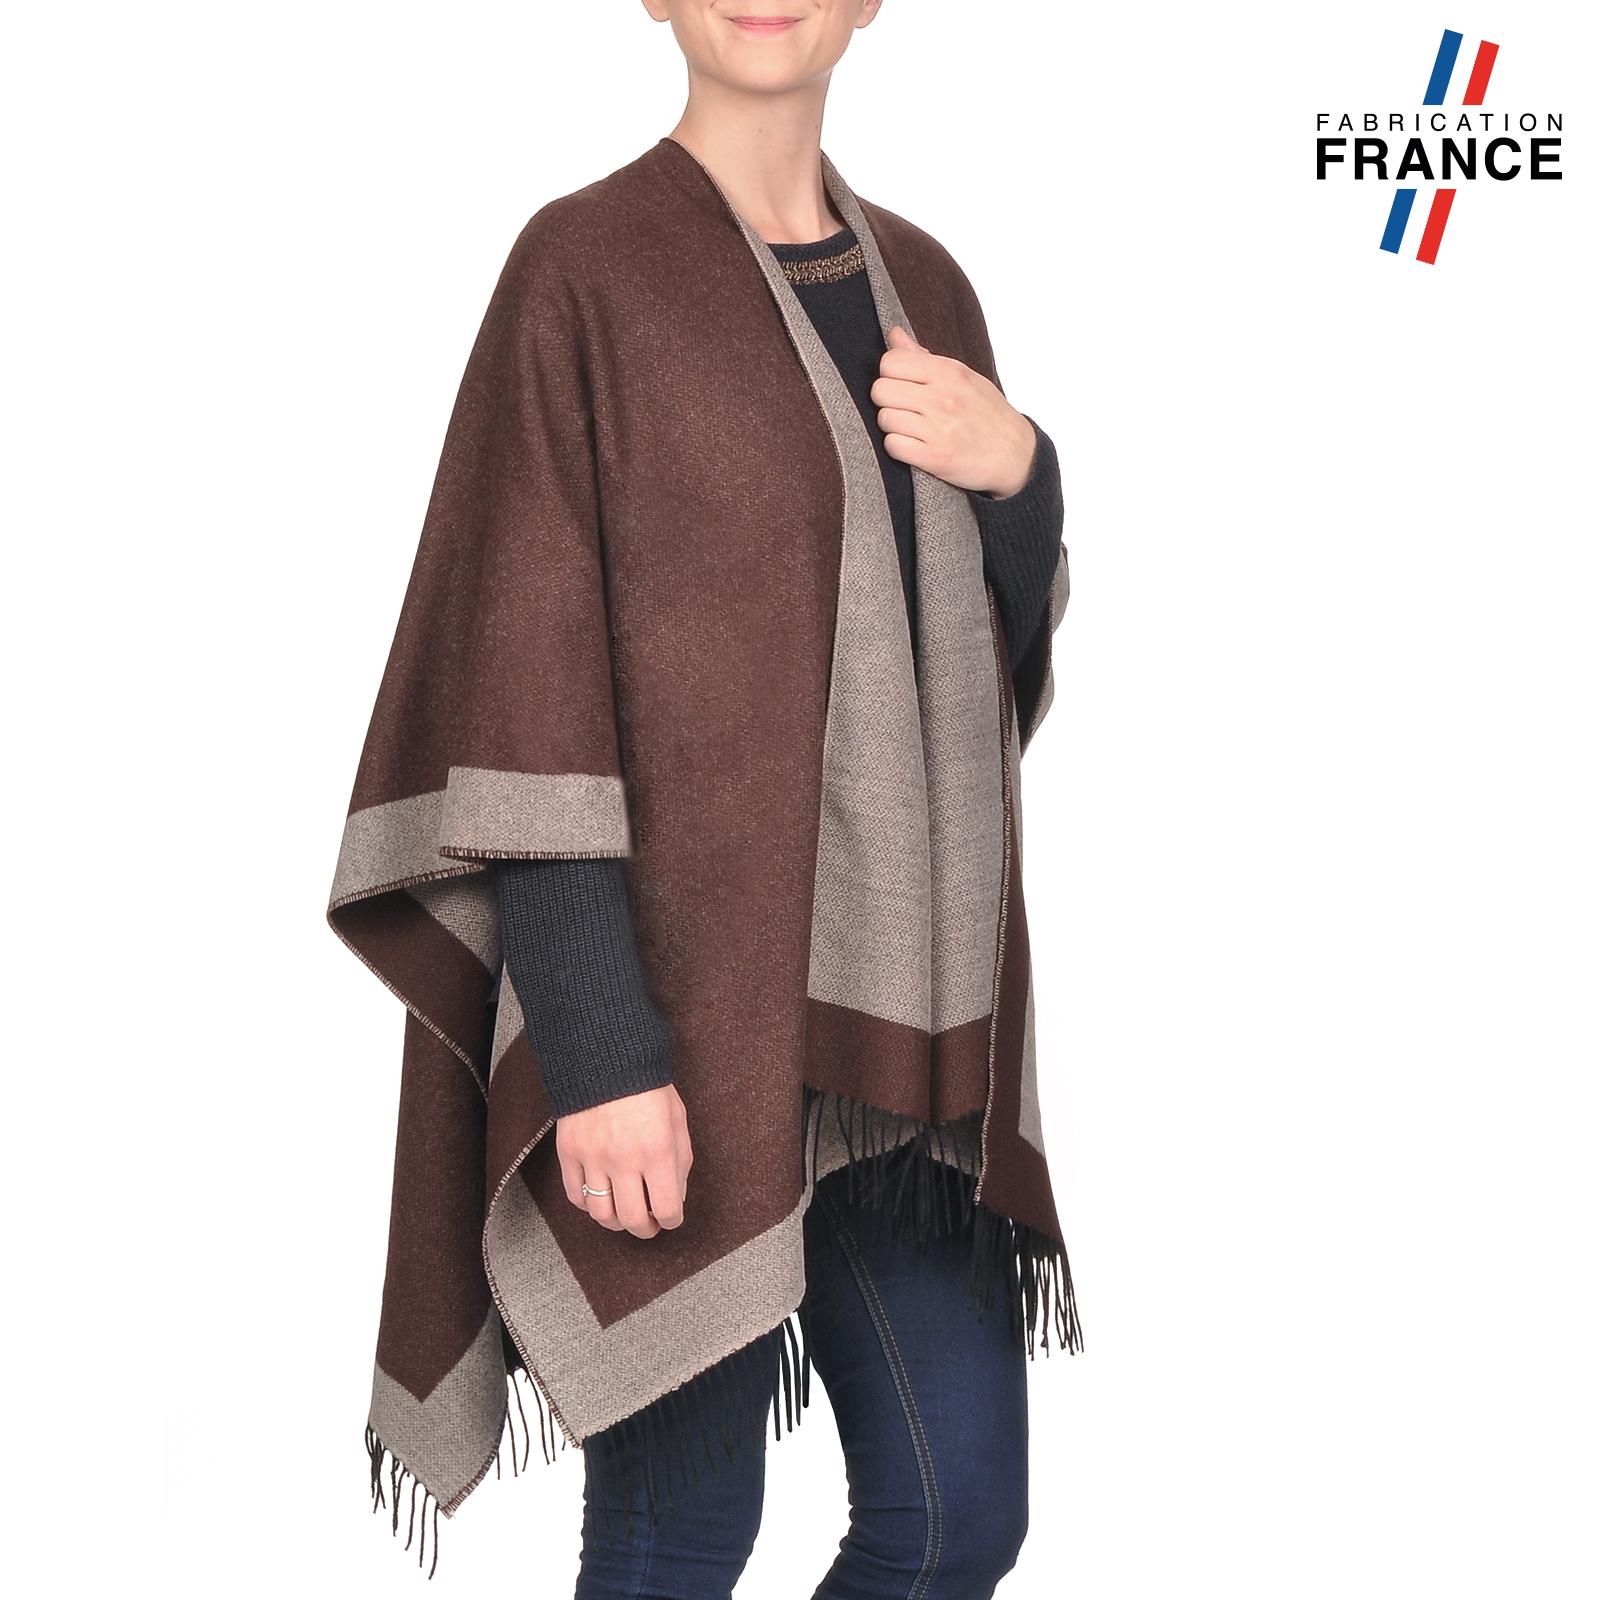 AT-03204-V16-poncho-a-franges-marron-gris-fabrication-france